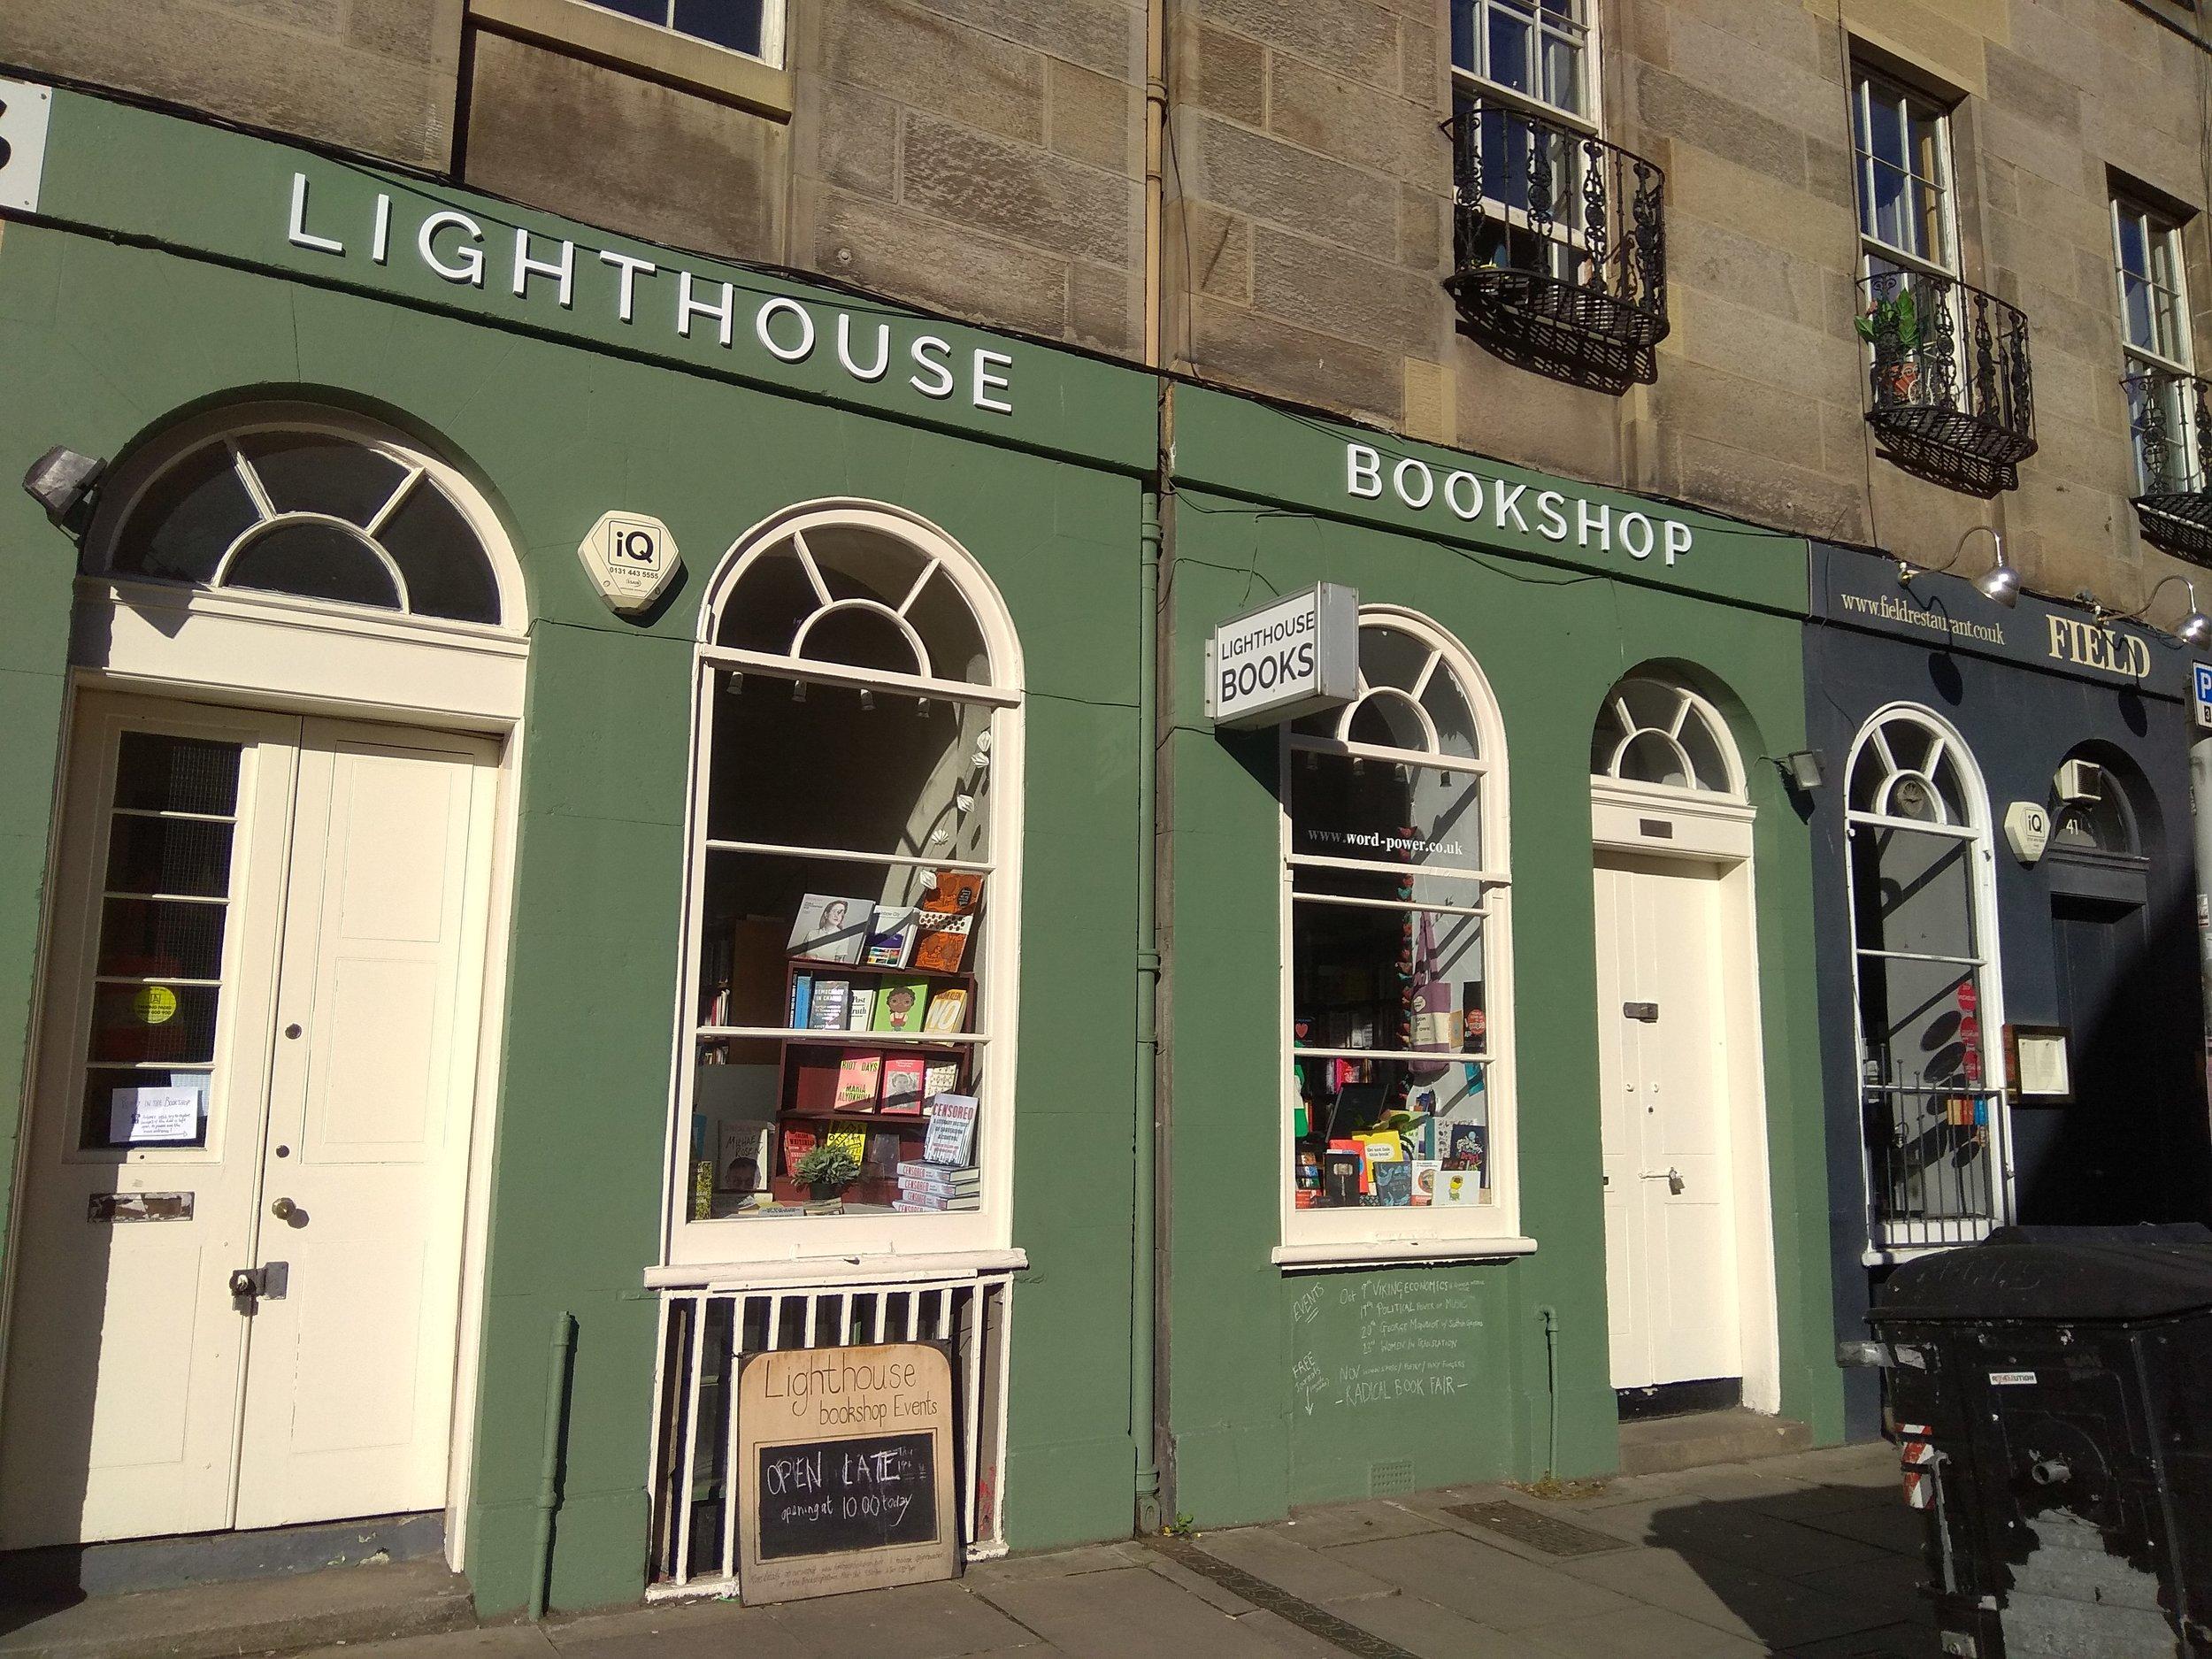 Lighthouse Bookshop.jpg